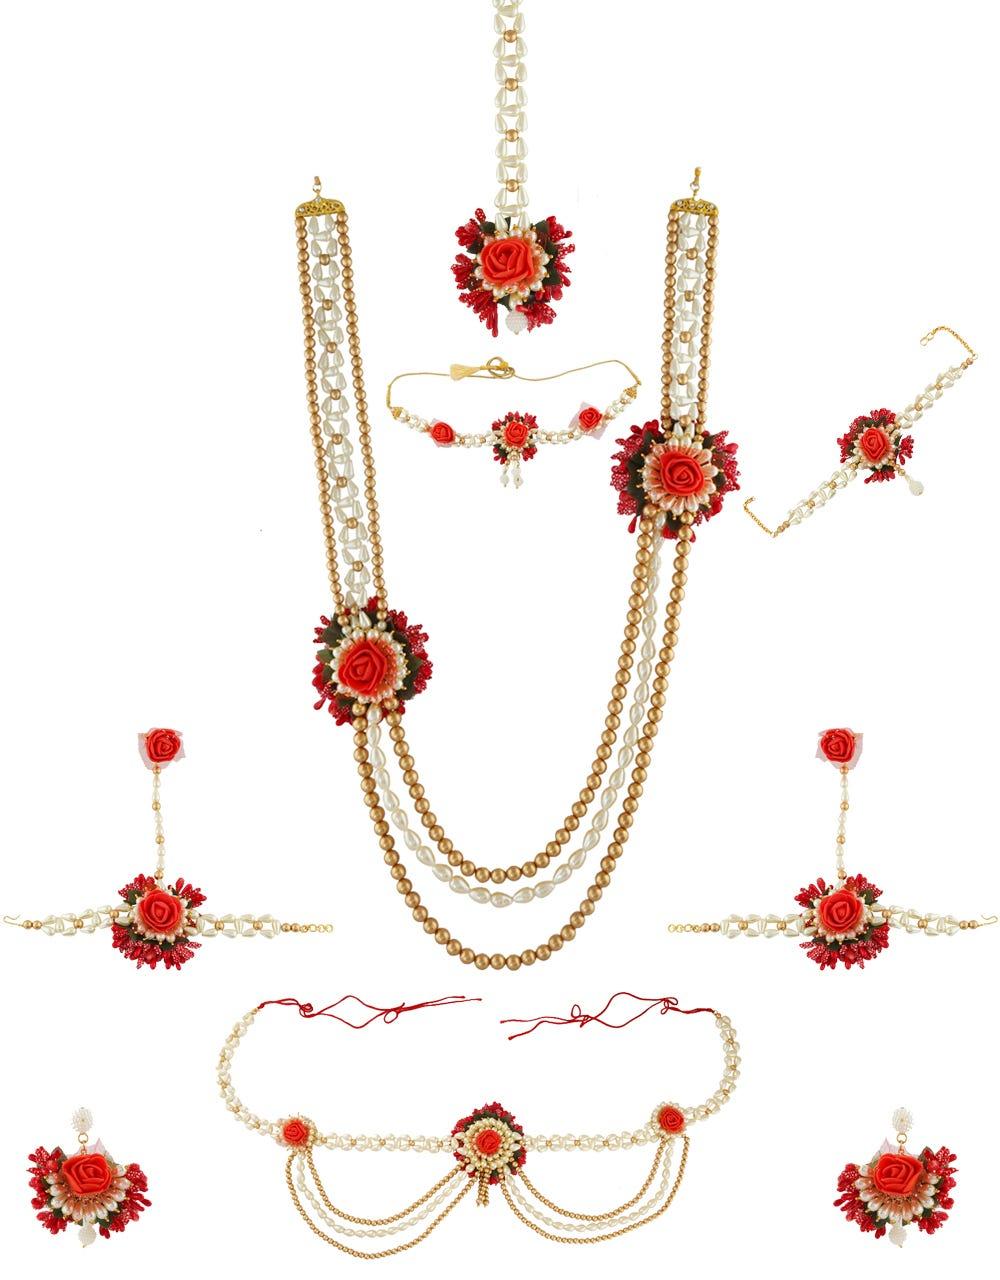 Dohale Jevan Jewellery : dohale, jevan, jewellery, Wedding, Season, Range, Flower, Jewellery, Online, Anuradha, Tanuja, Medium